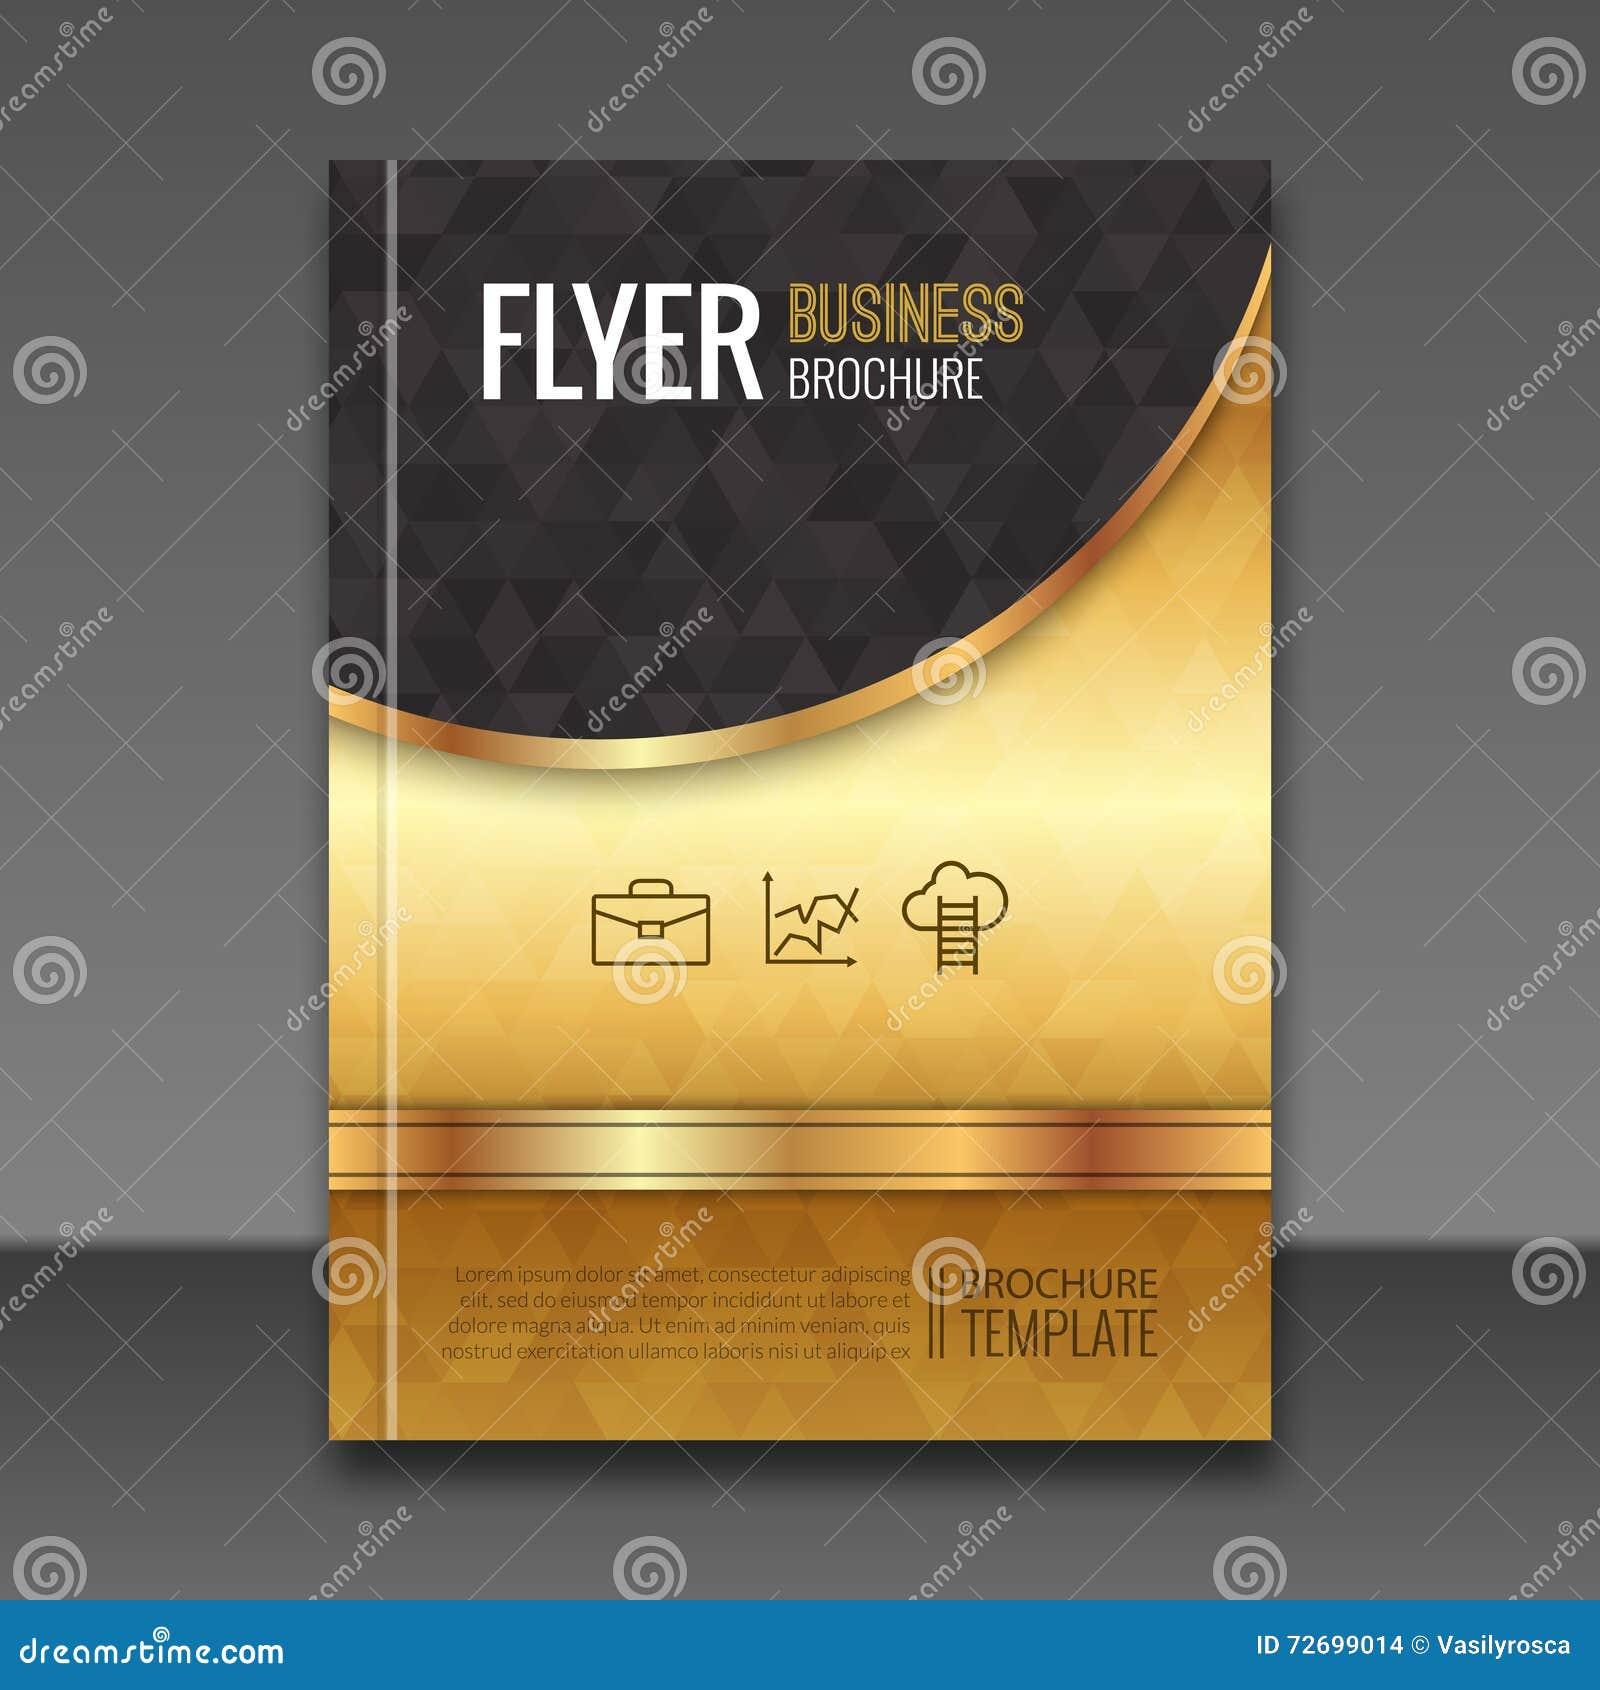 Book Cover Design Photo Elements : Golden background flyer template luxury brochure book